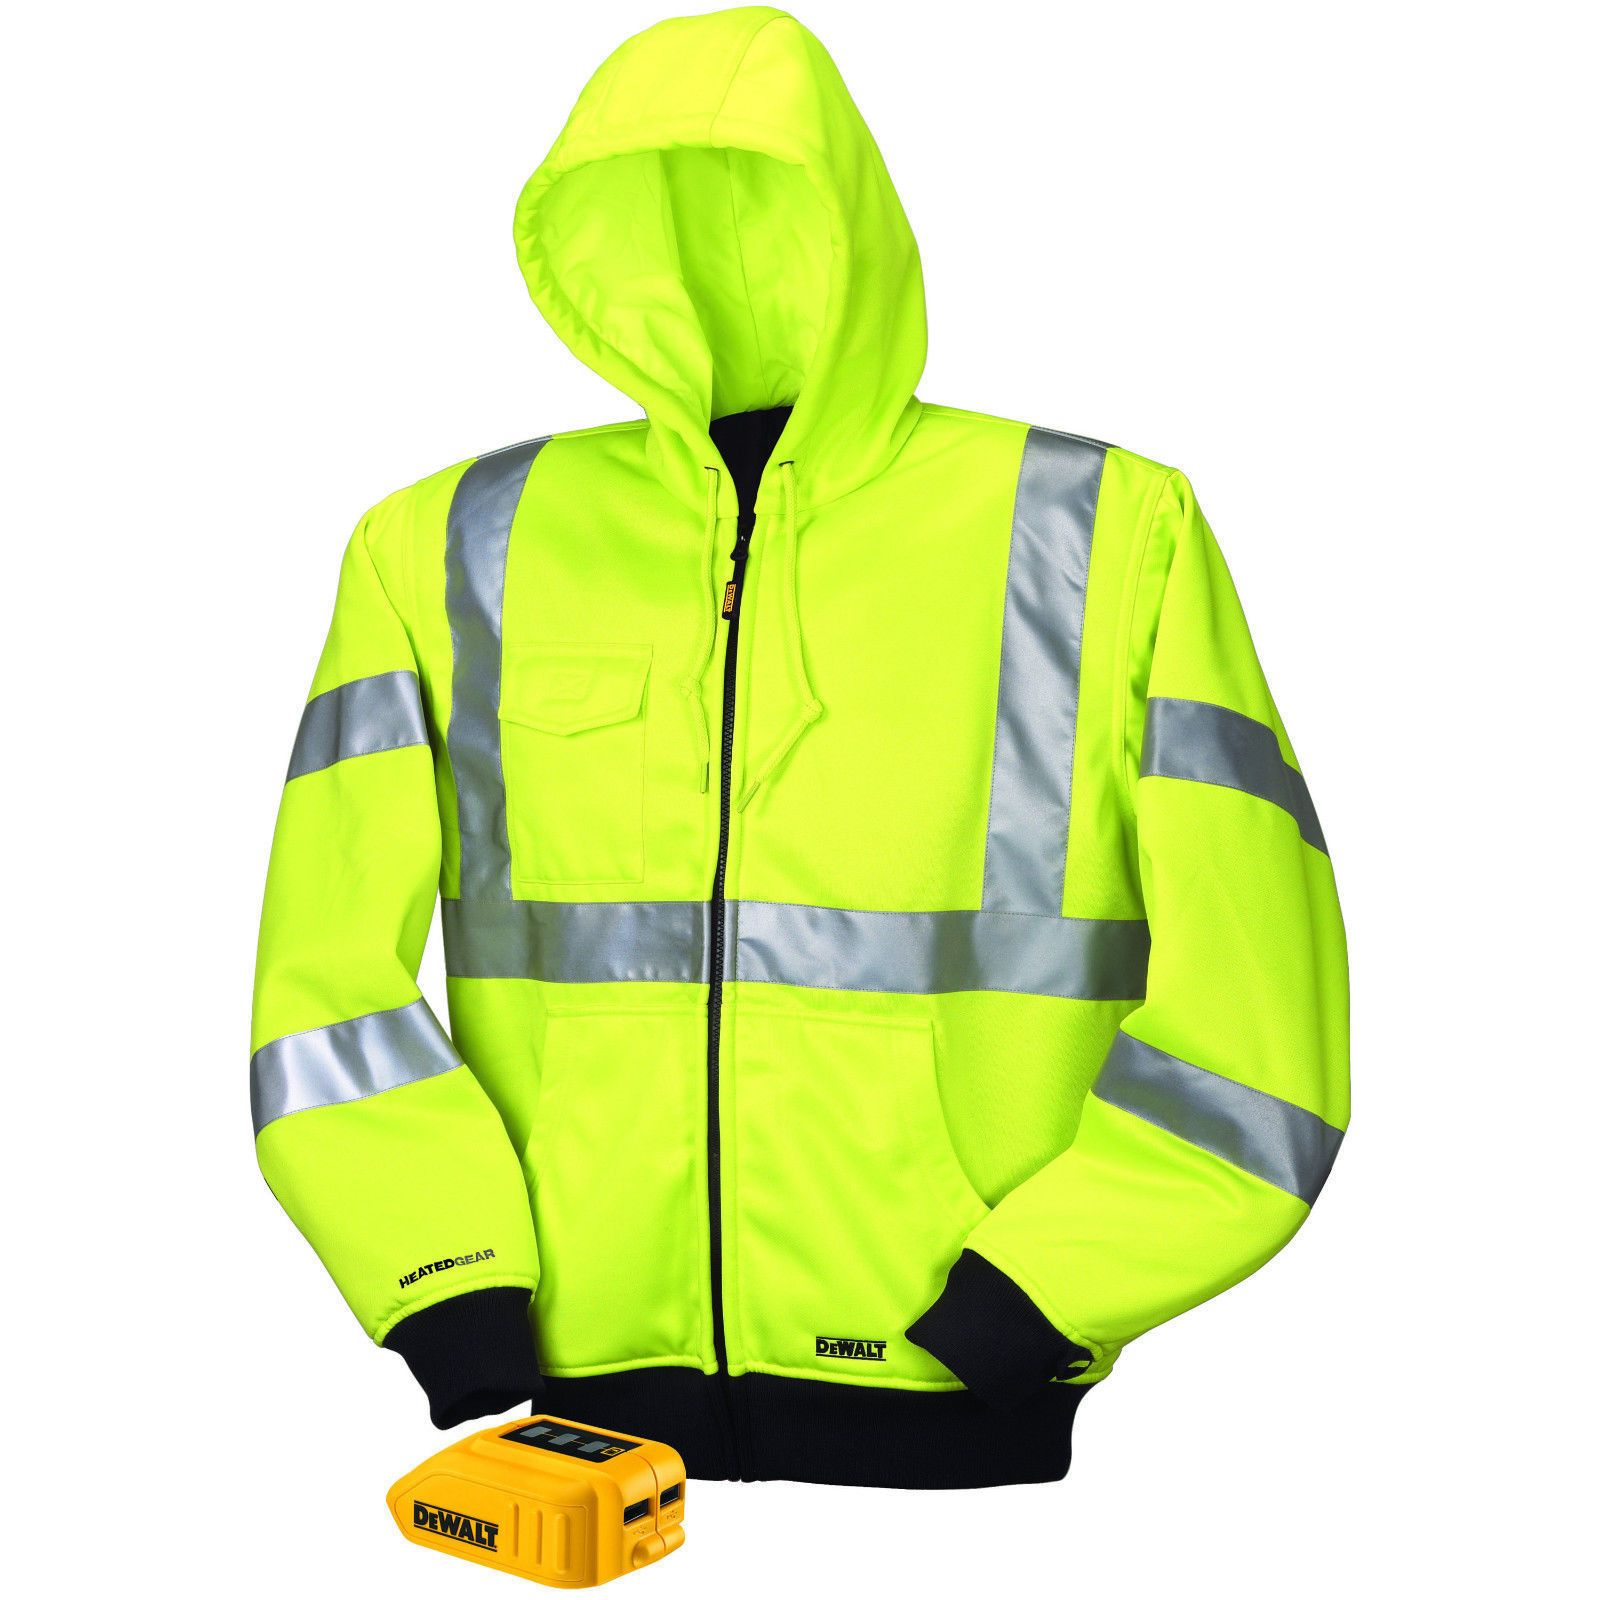 Dewalt Dchj071 Heated High Visibility Class 3 Hoodie Jacket Outdoor Work Hi Viz Drawstring Hoodie Heated Jacket Versatile Jackets